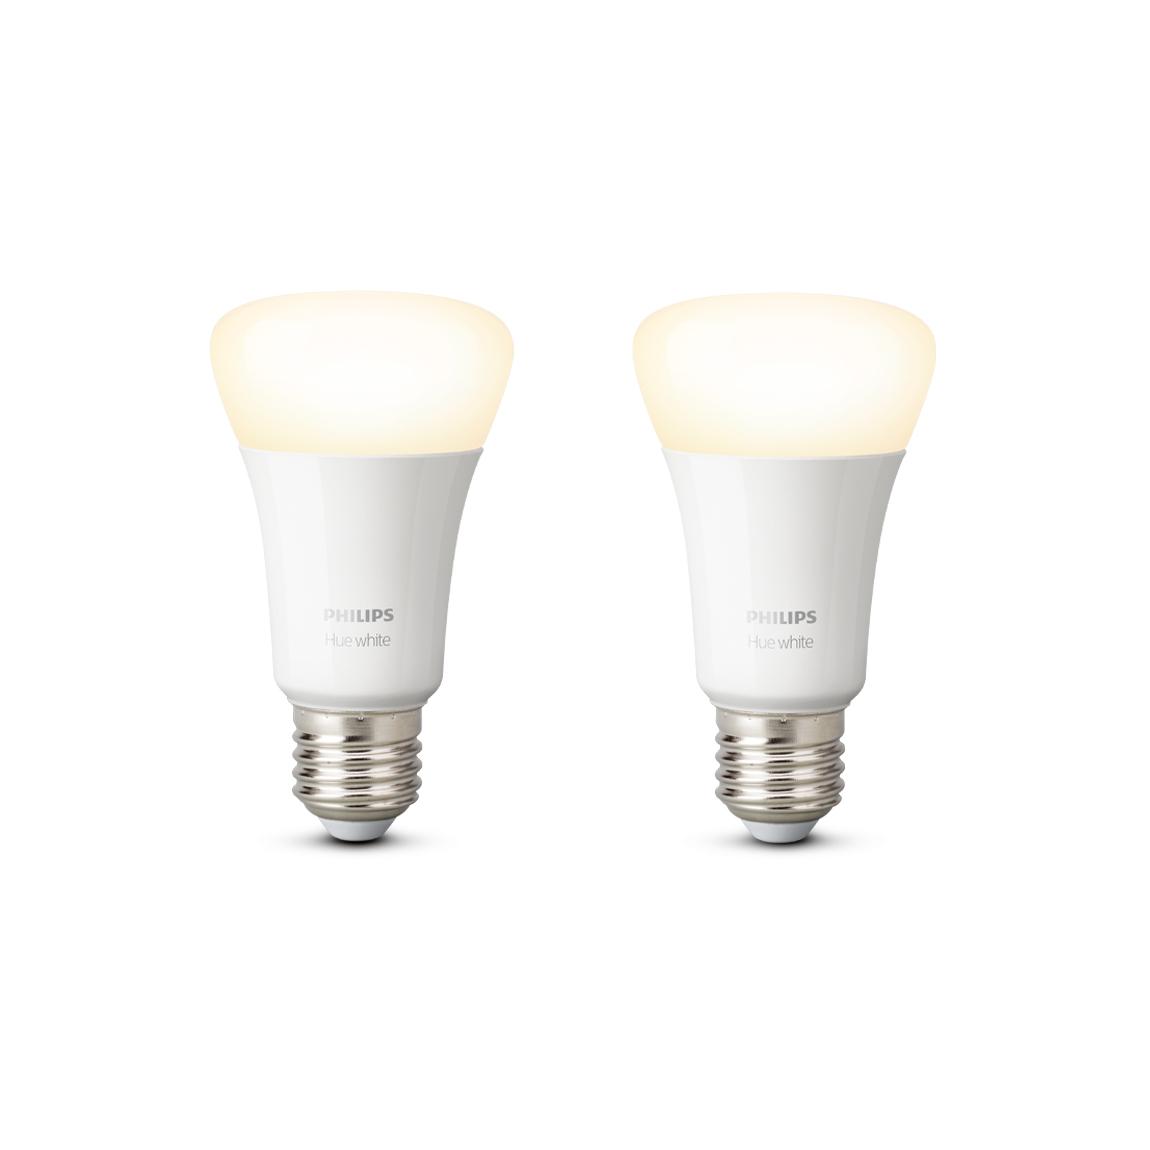 Philips Hue White E27 Bluetooth 2er Set - LED-Lampe - Weiß